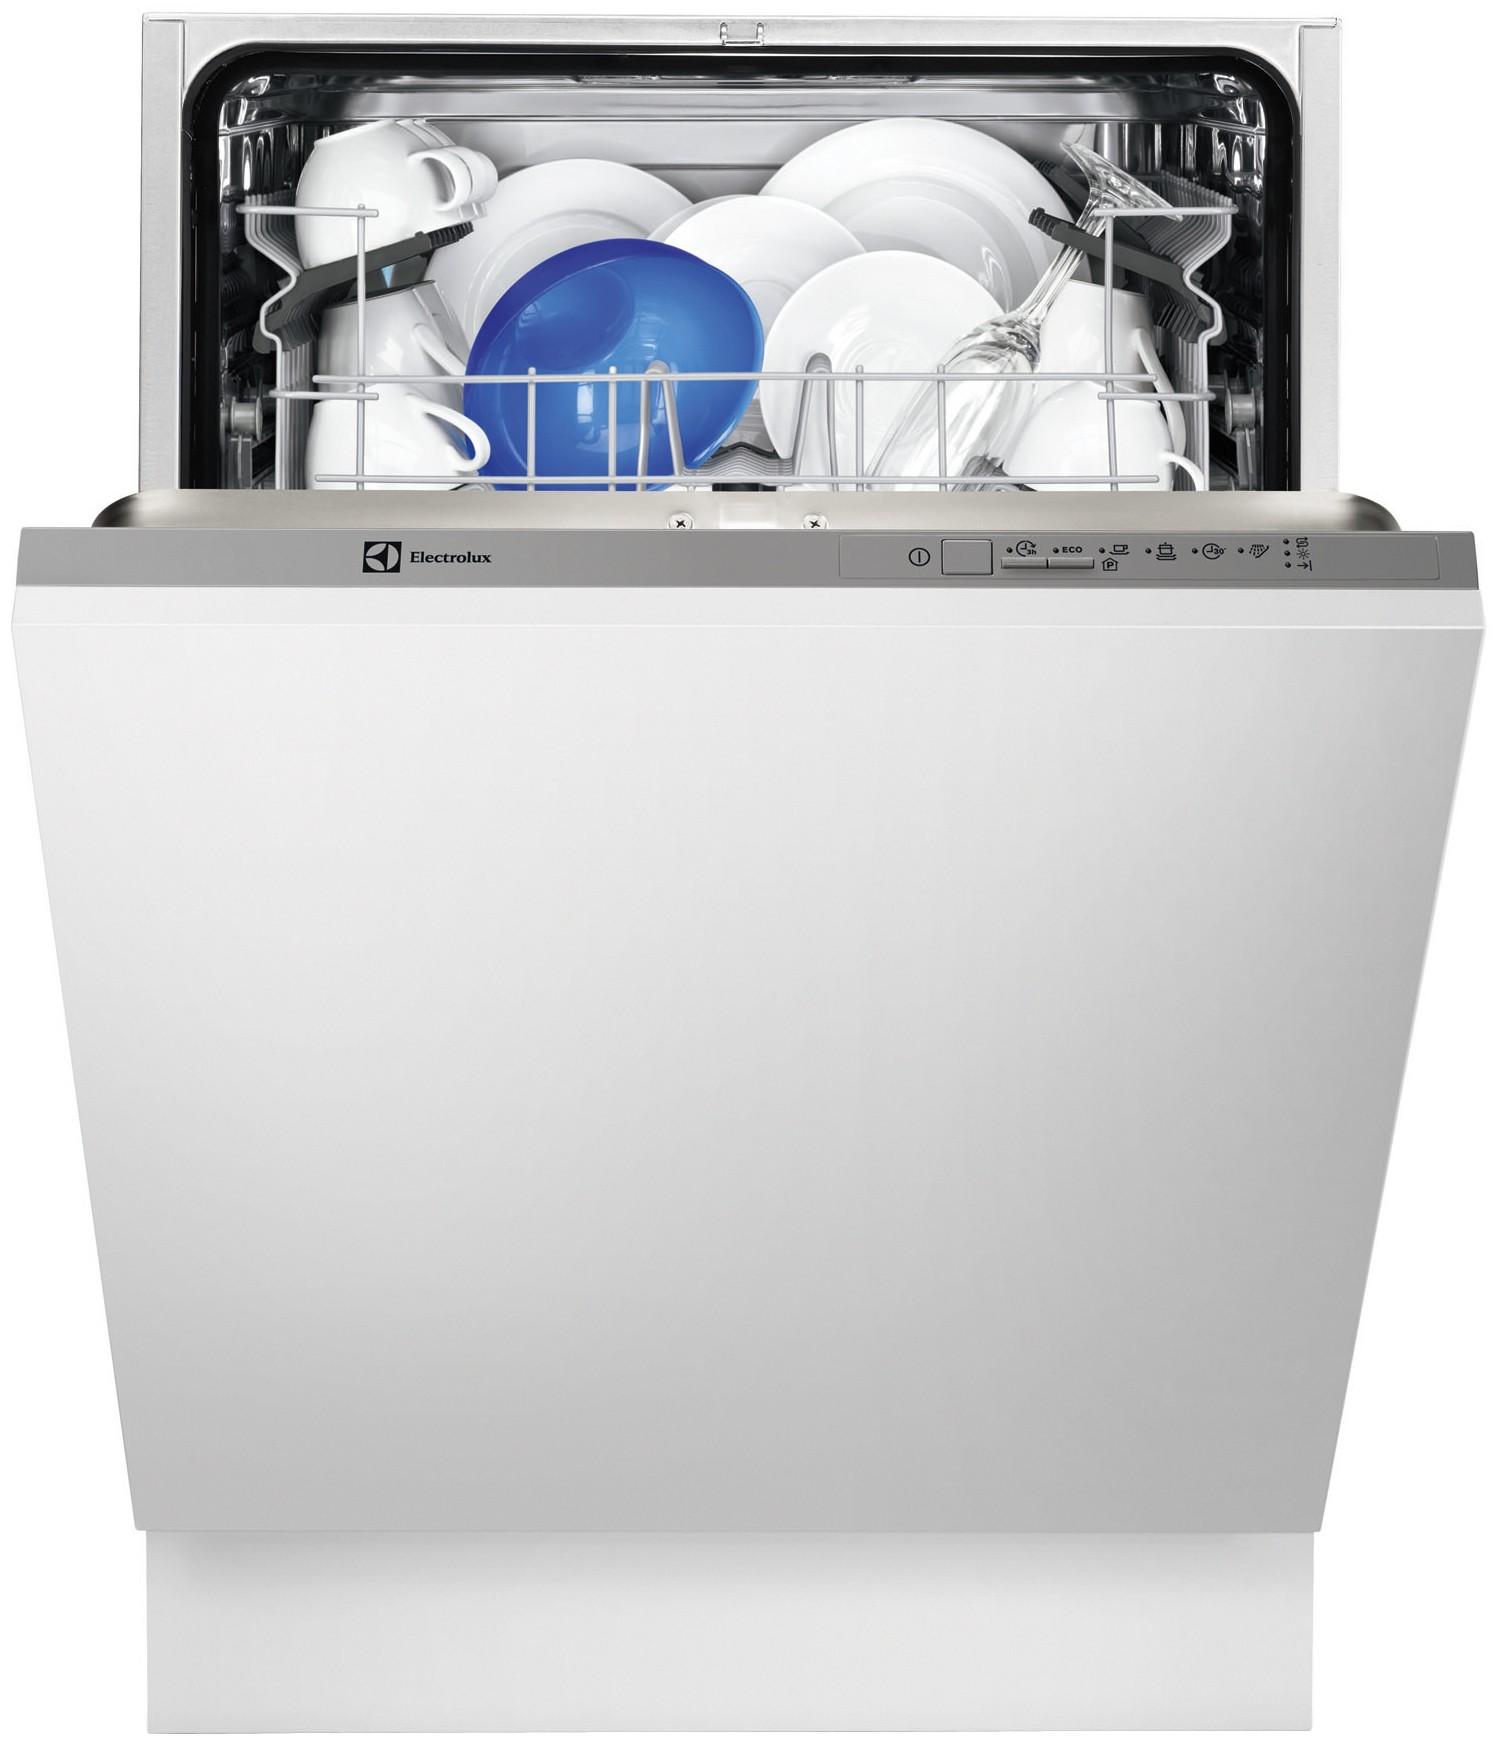 ESL5201LO : Electrolux oppvaskmaskin ESL5201LO